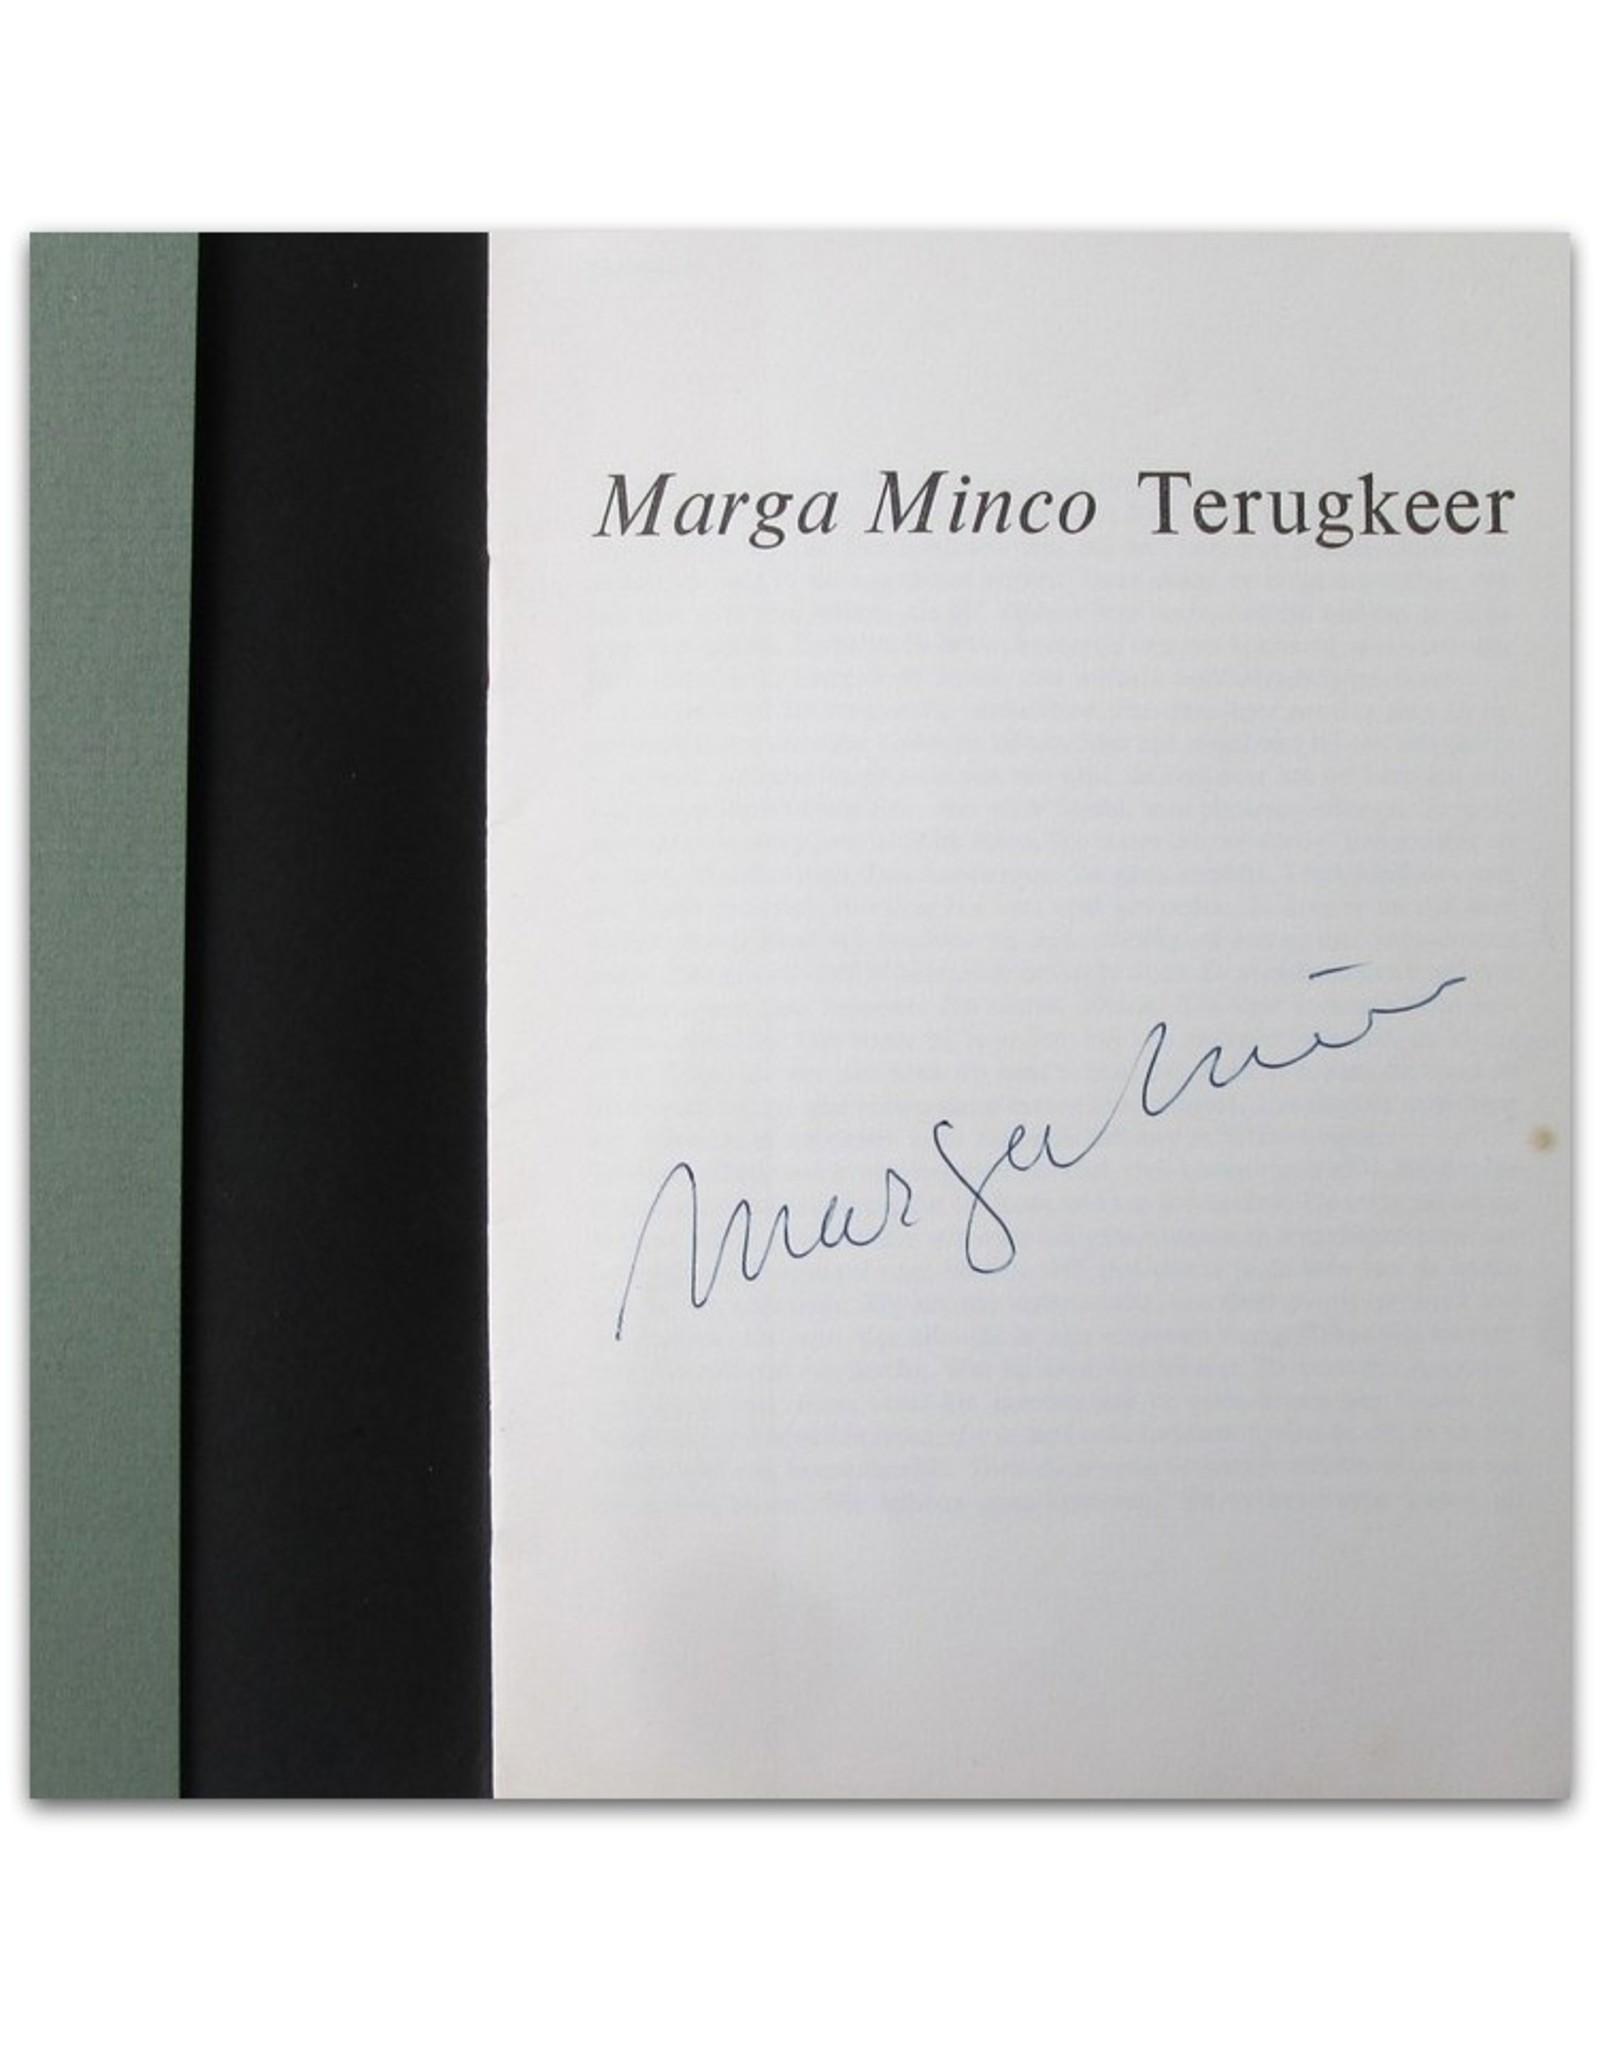 Marga Minco - Terugkeer